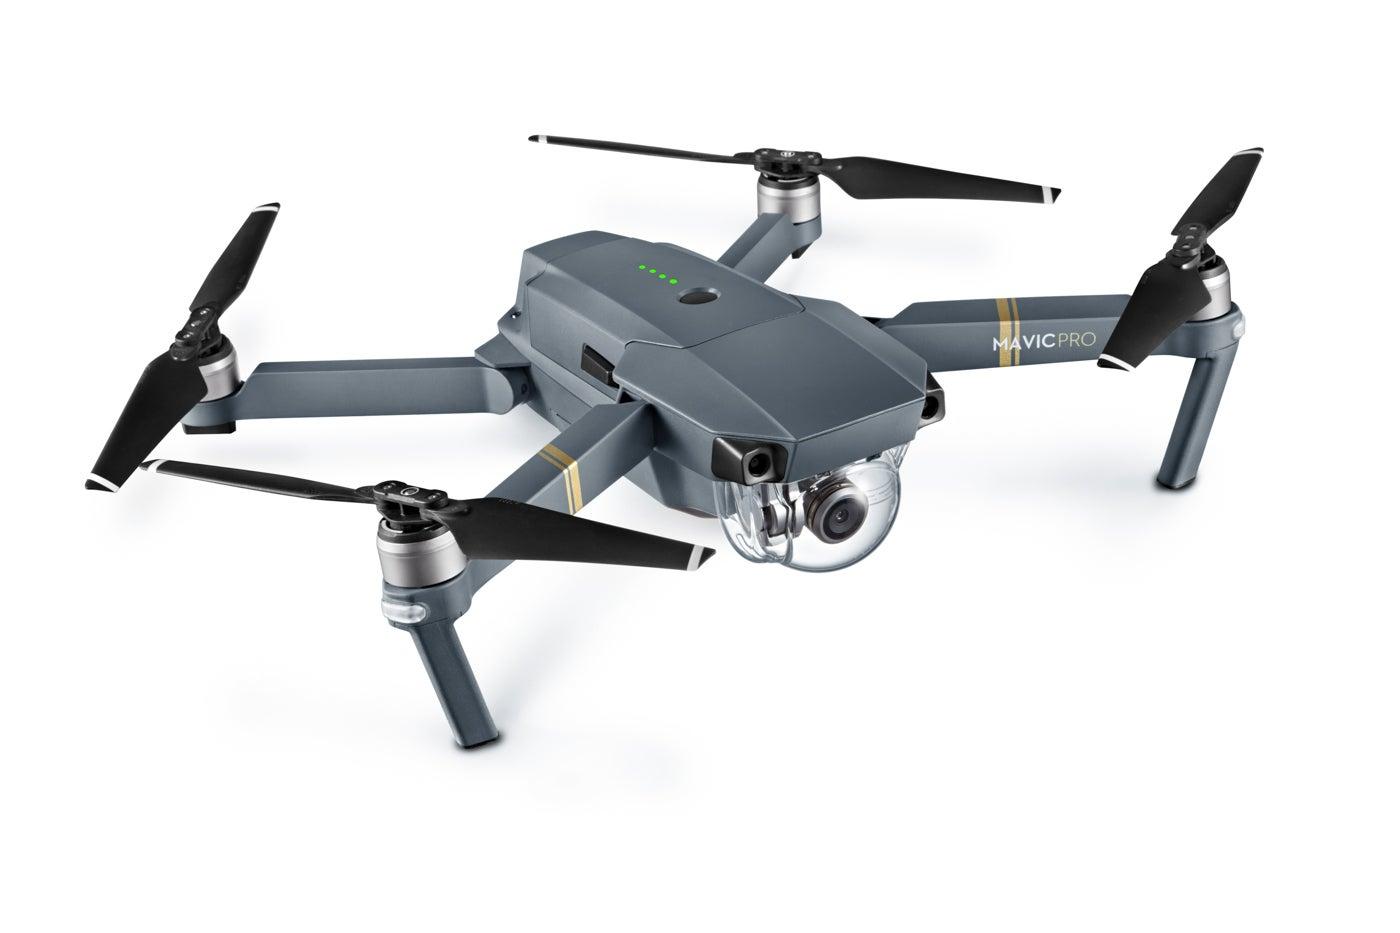 dji-mavic-pro drones gopro gopro-karma